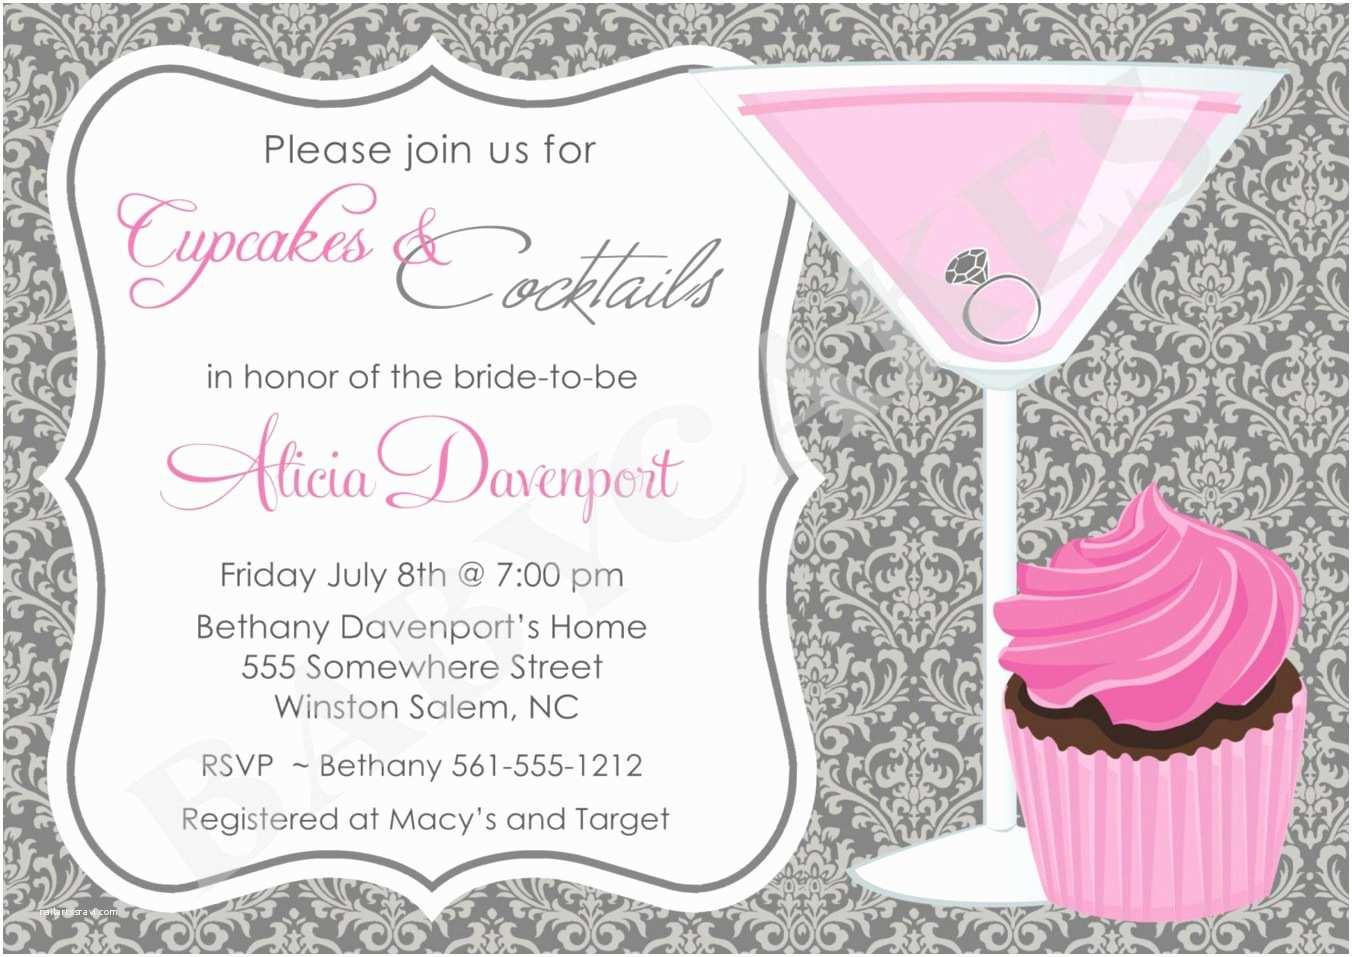 Cocktail Party Invitation Cocktail Party Invitation Card Template